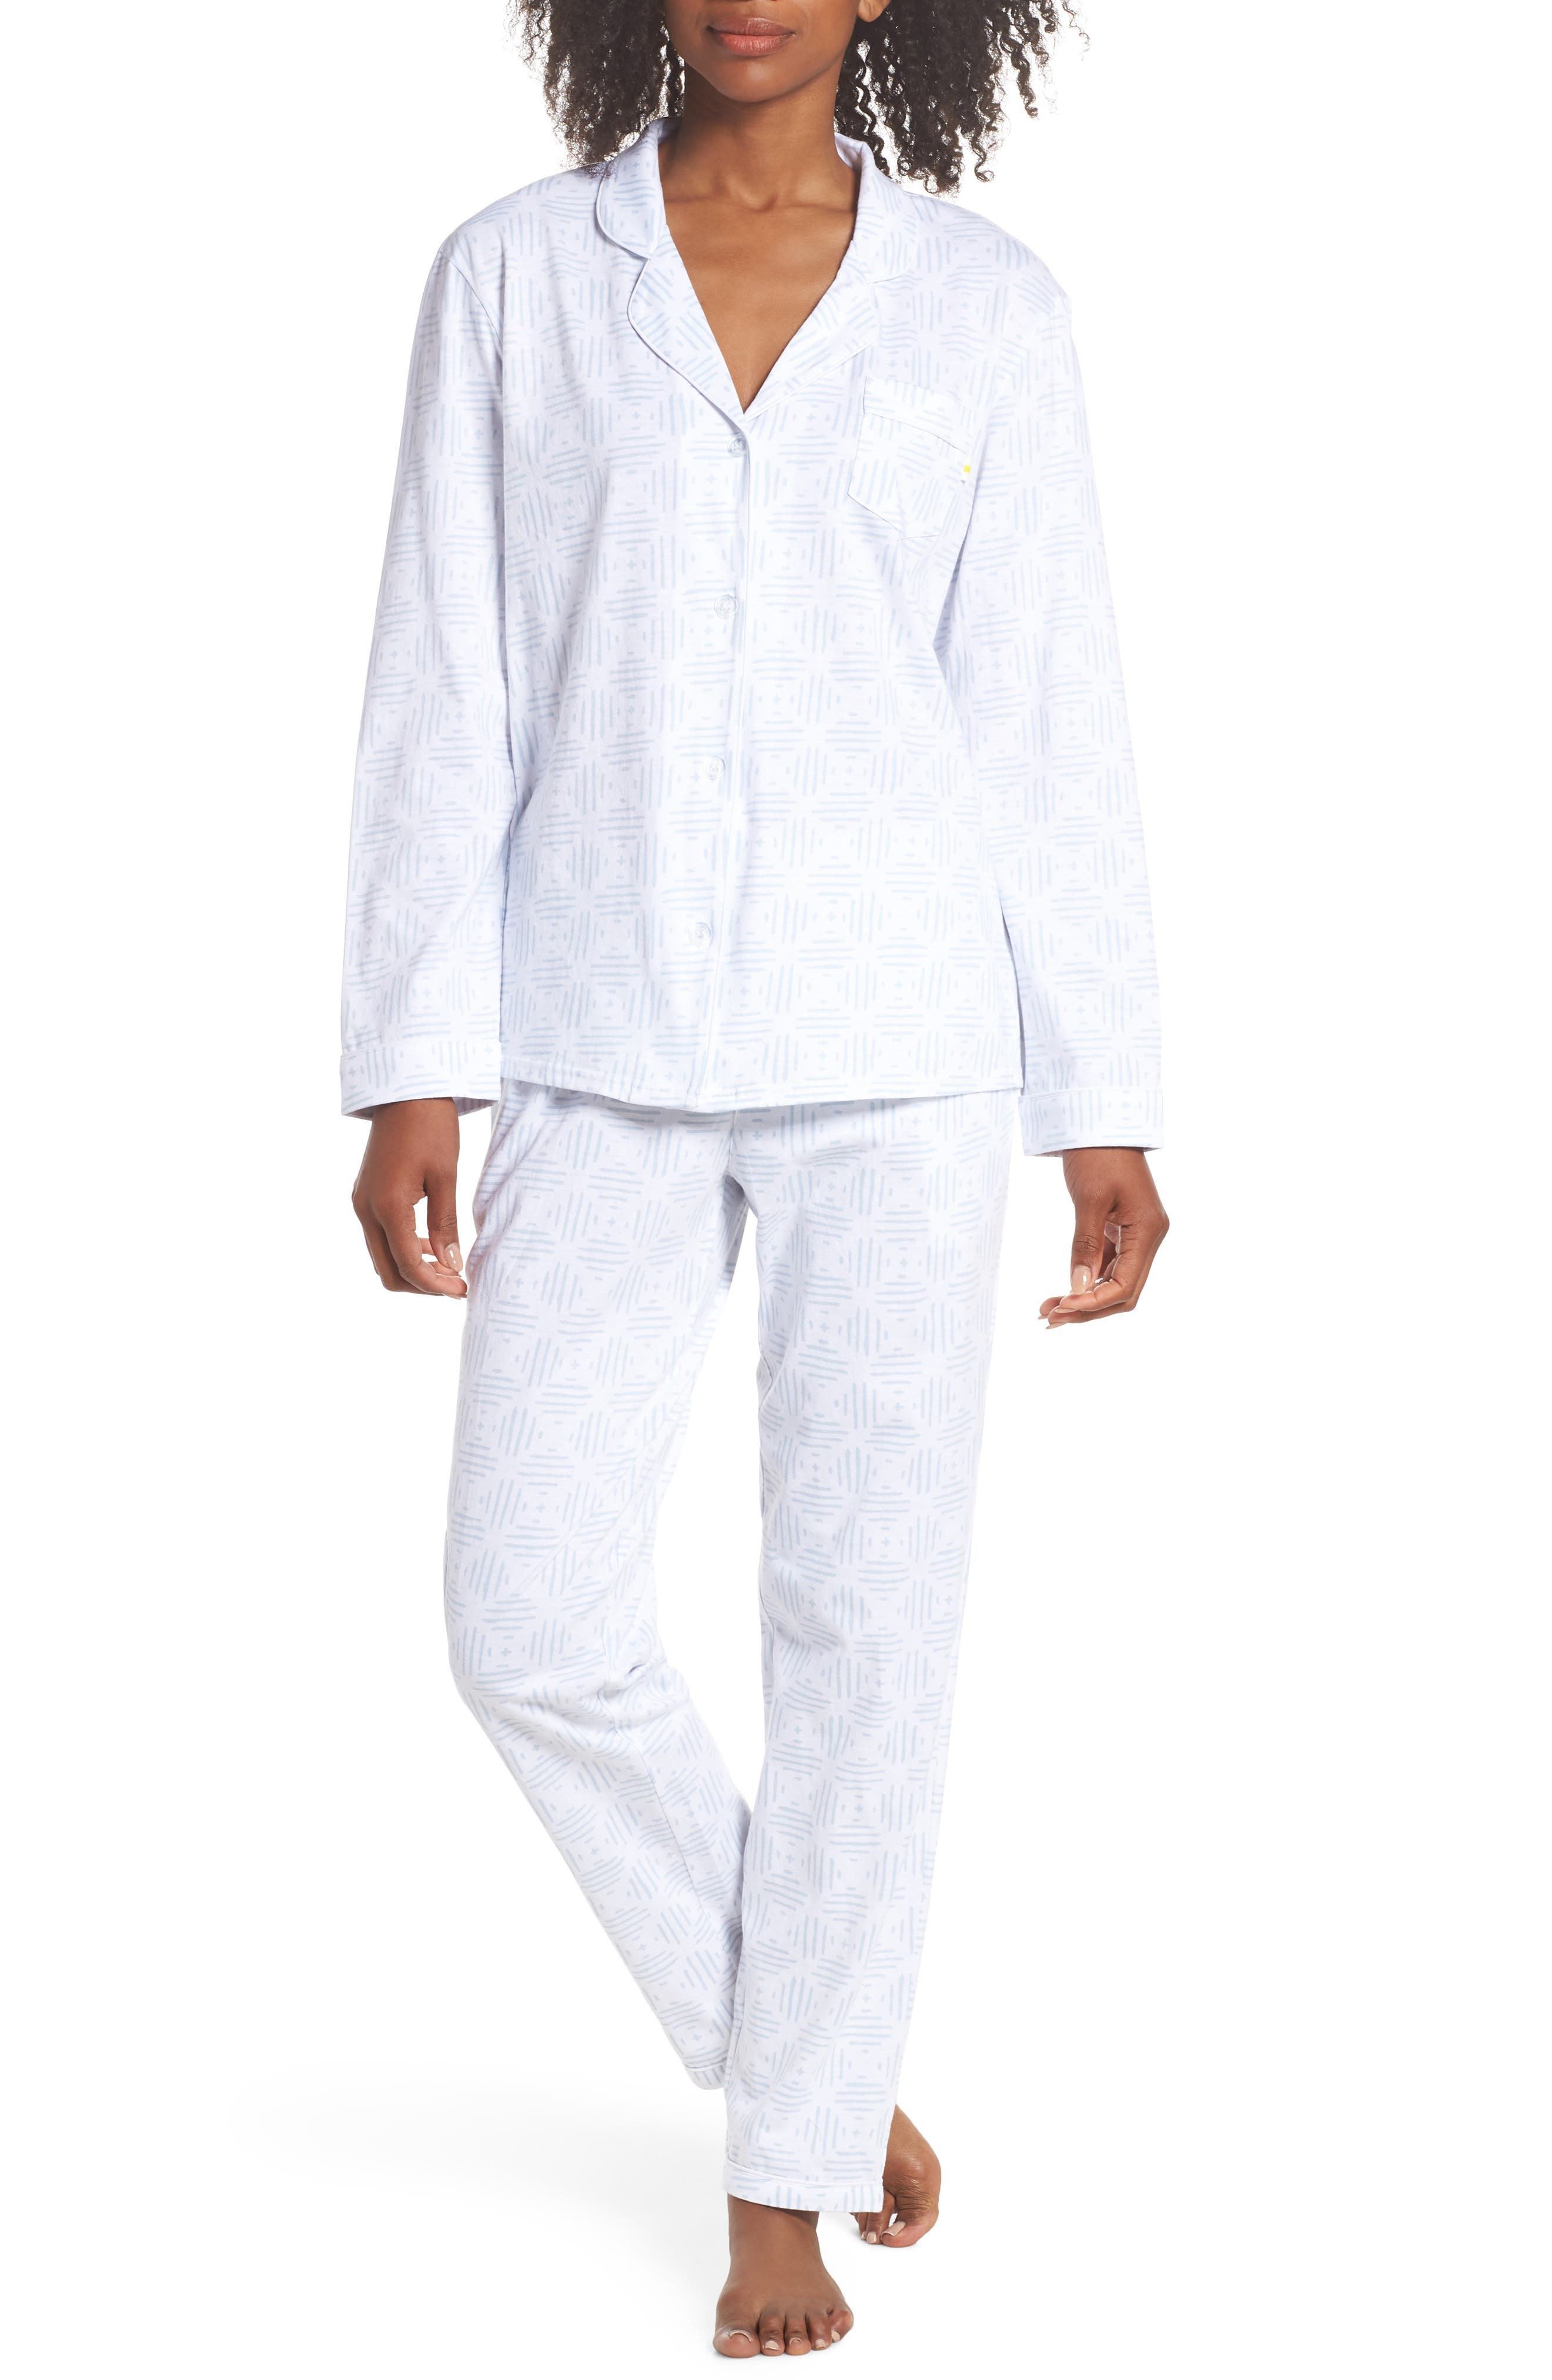 Moroccan Tile Pajamas,                             Main thumbnail 1, color,                             Moro Tile Blue